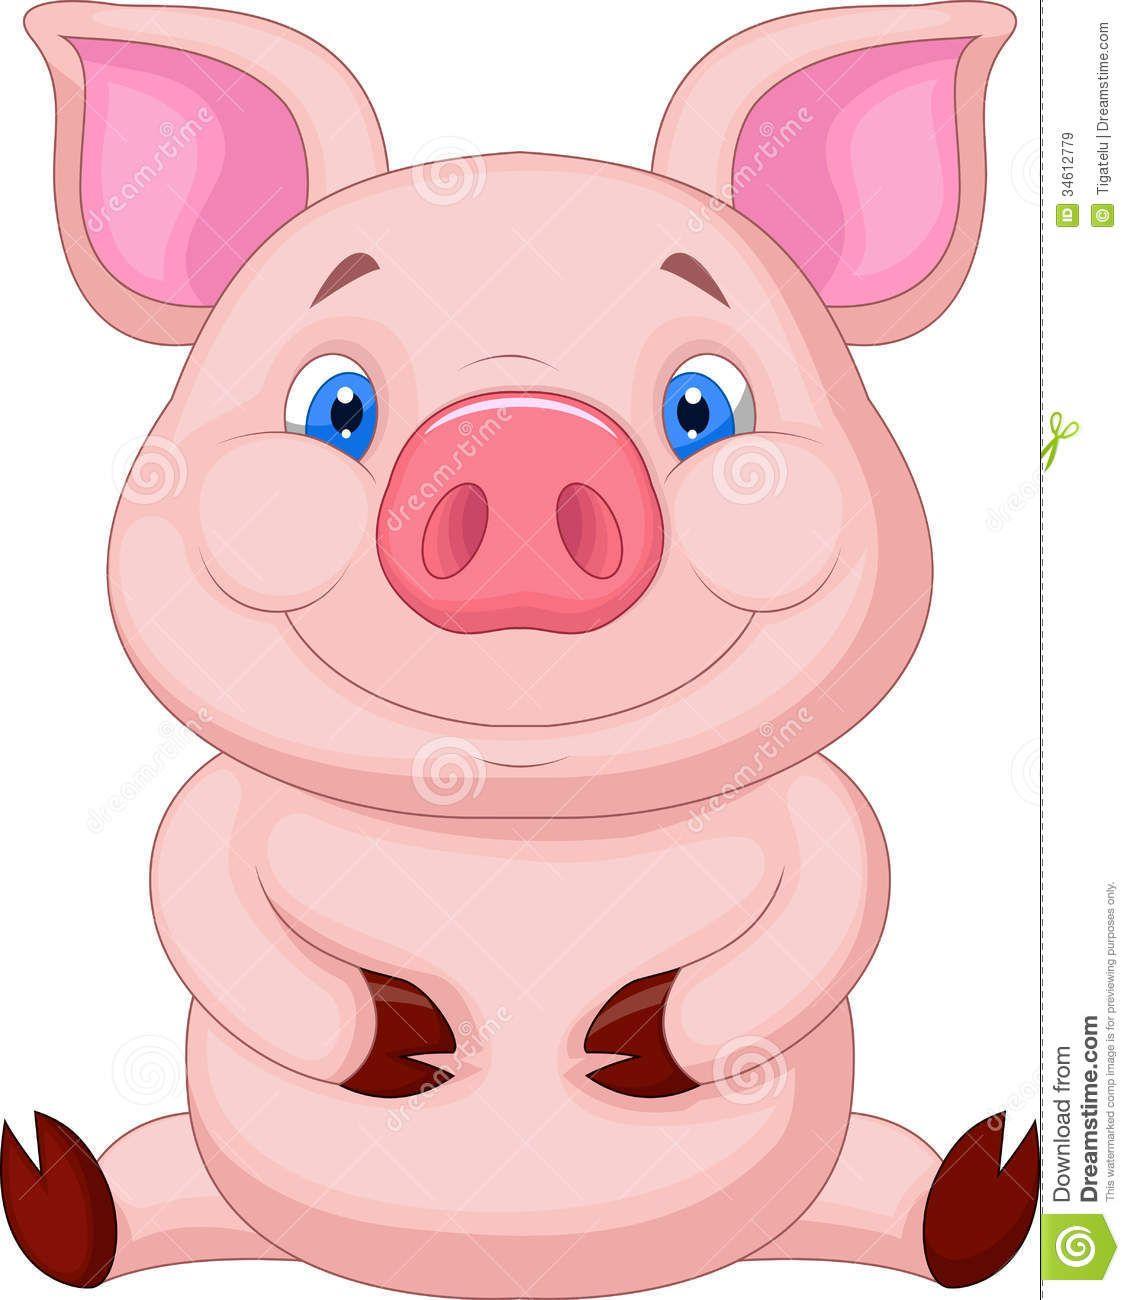 cute cartoon pigs wallpaper version - photo #34